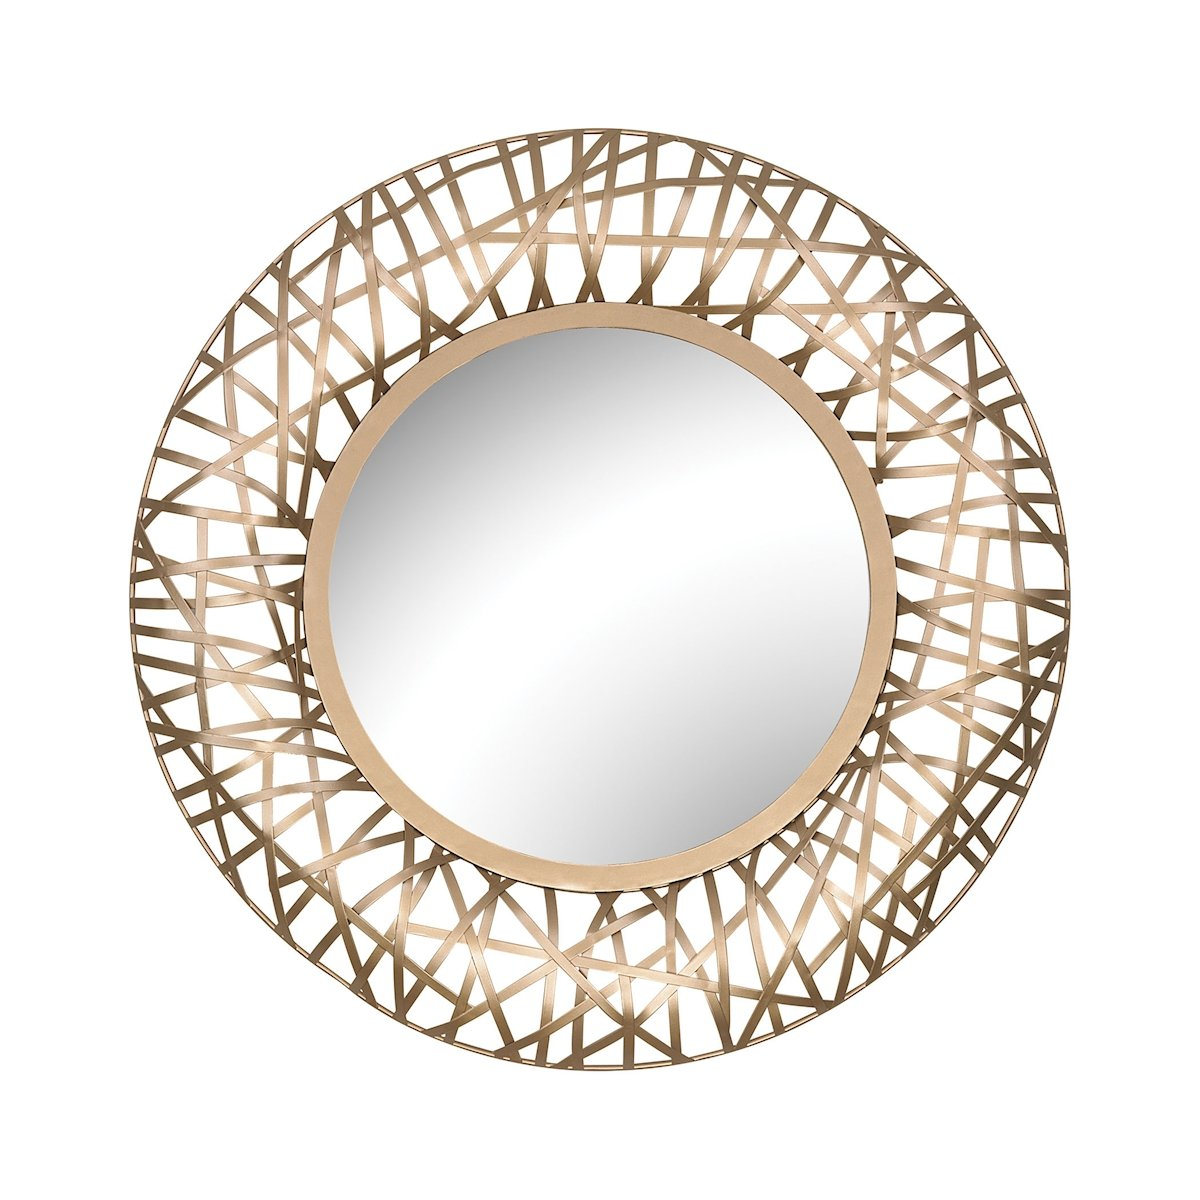 Birch Wall Mirror